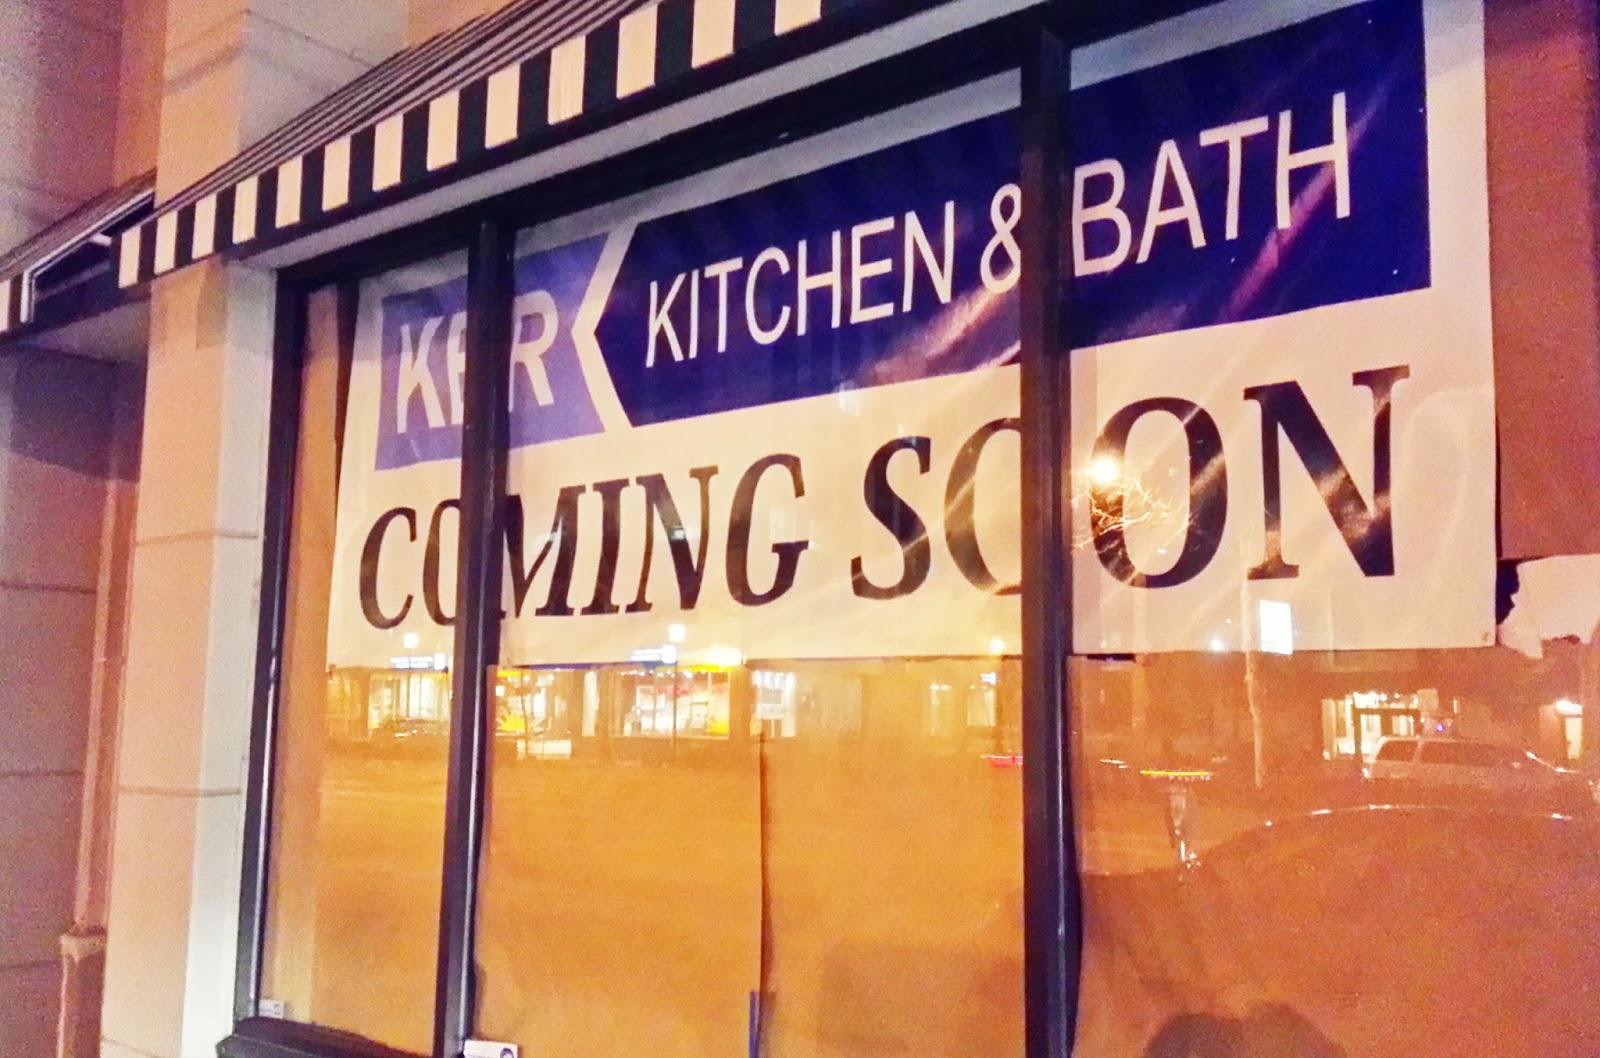 Robert Dyer Bethesda Row Kbr Kitchen And Bath Opening In Bethesda Photos